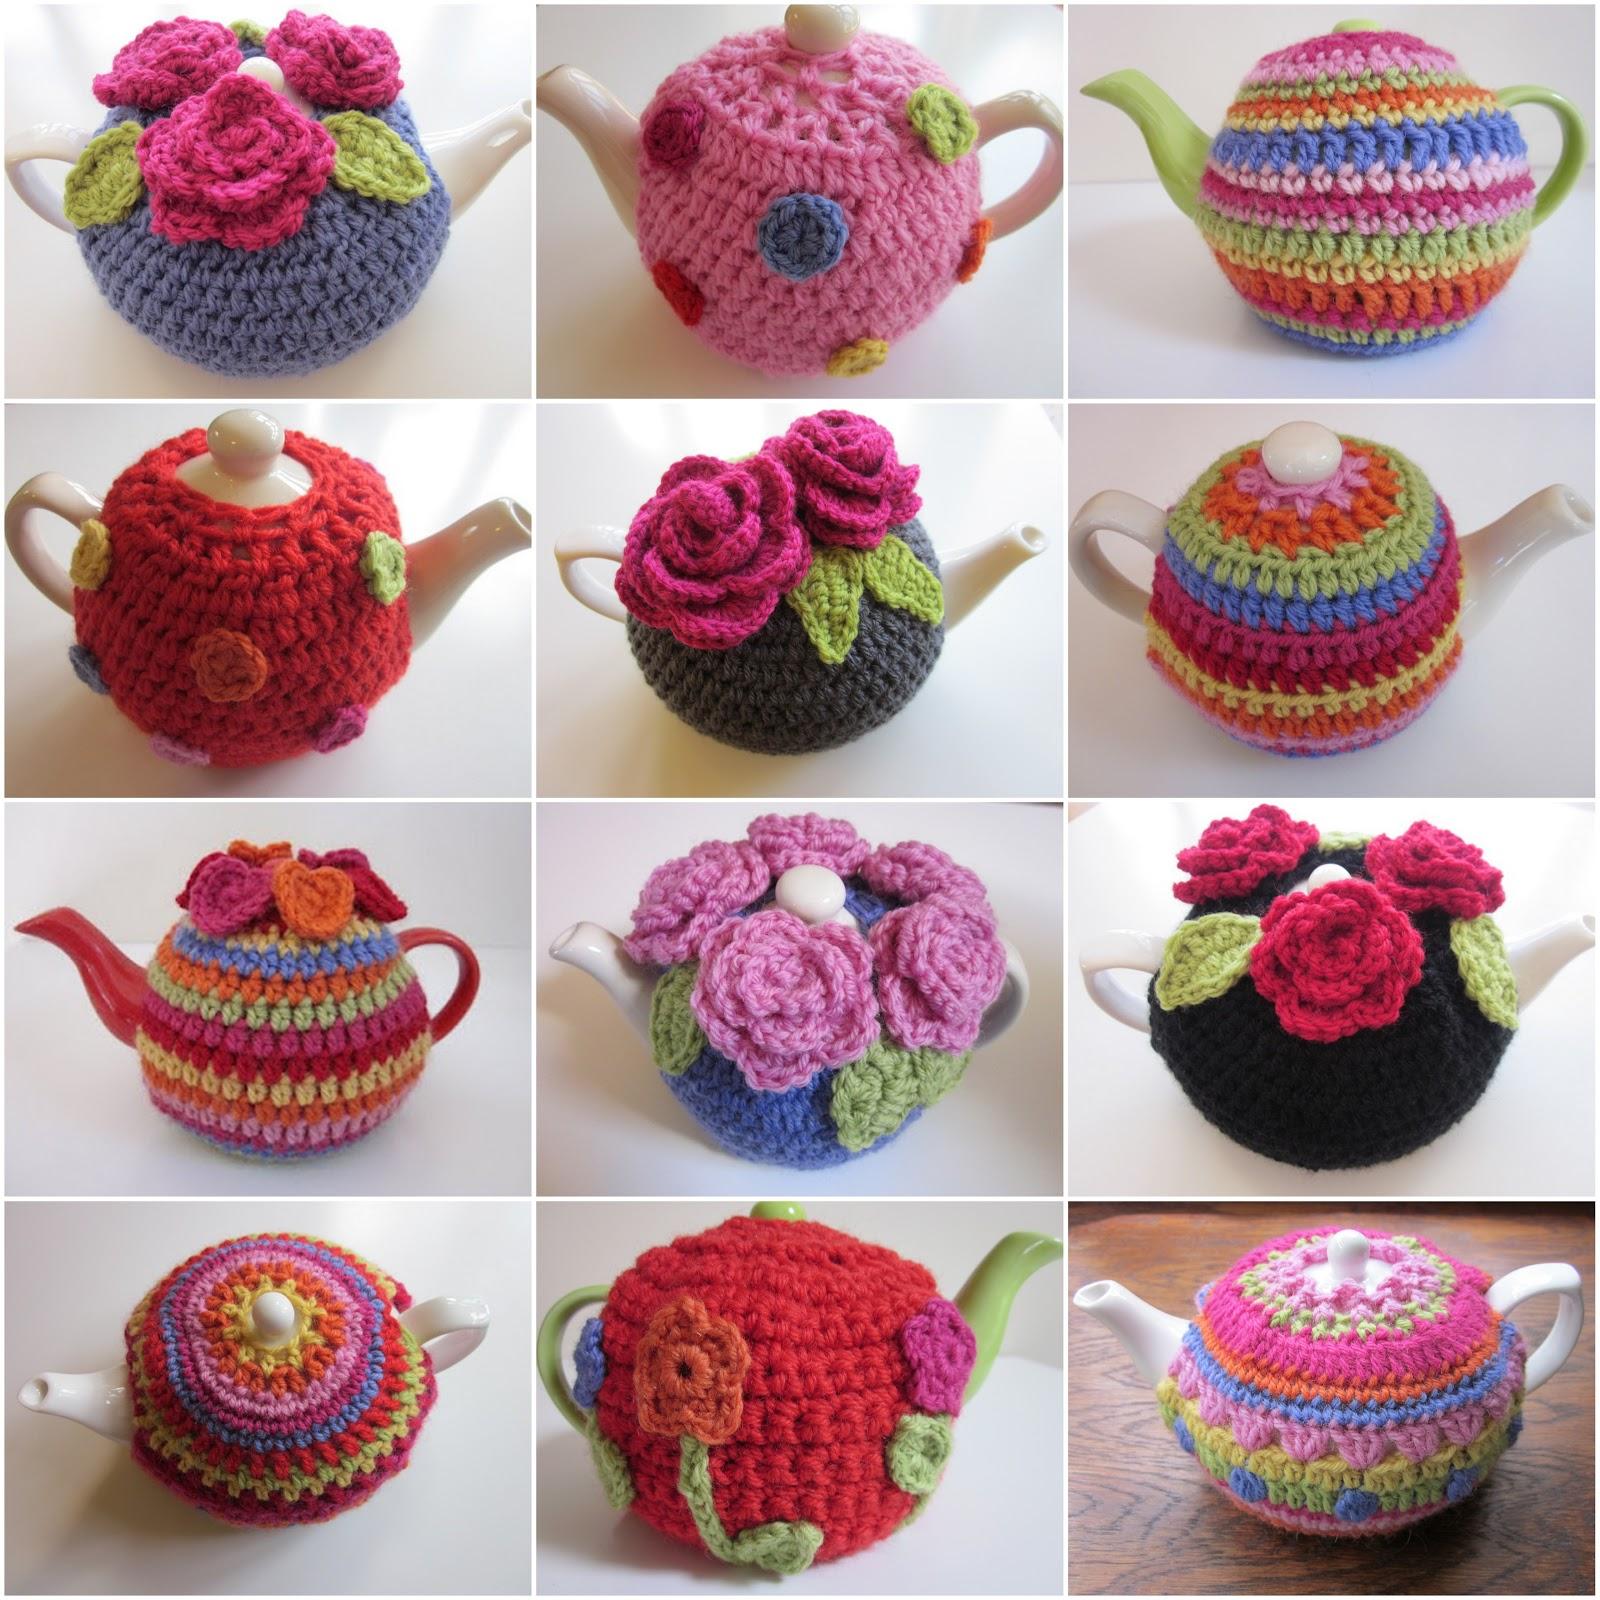 http://whydidntanyonetellme.blogspot.com.es/search/label/Crochet